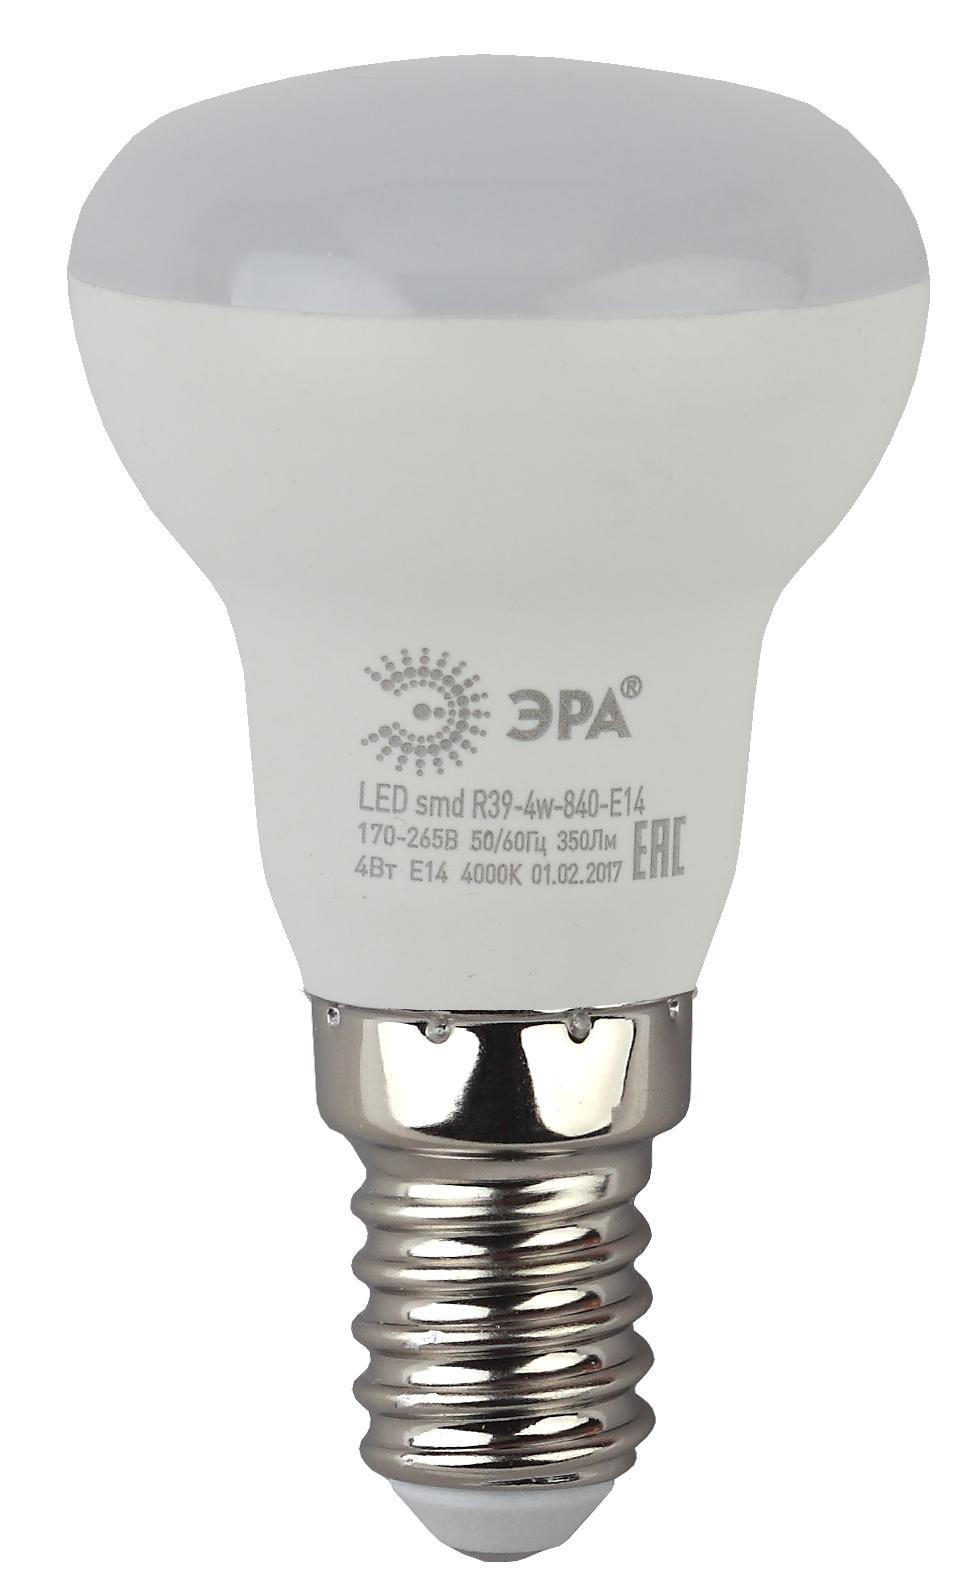 Лампа светодиодная ЭРА Led smd r39-4w-840-e14